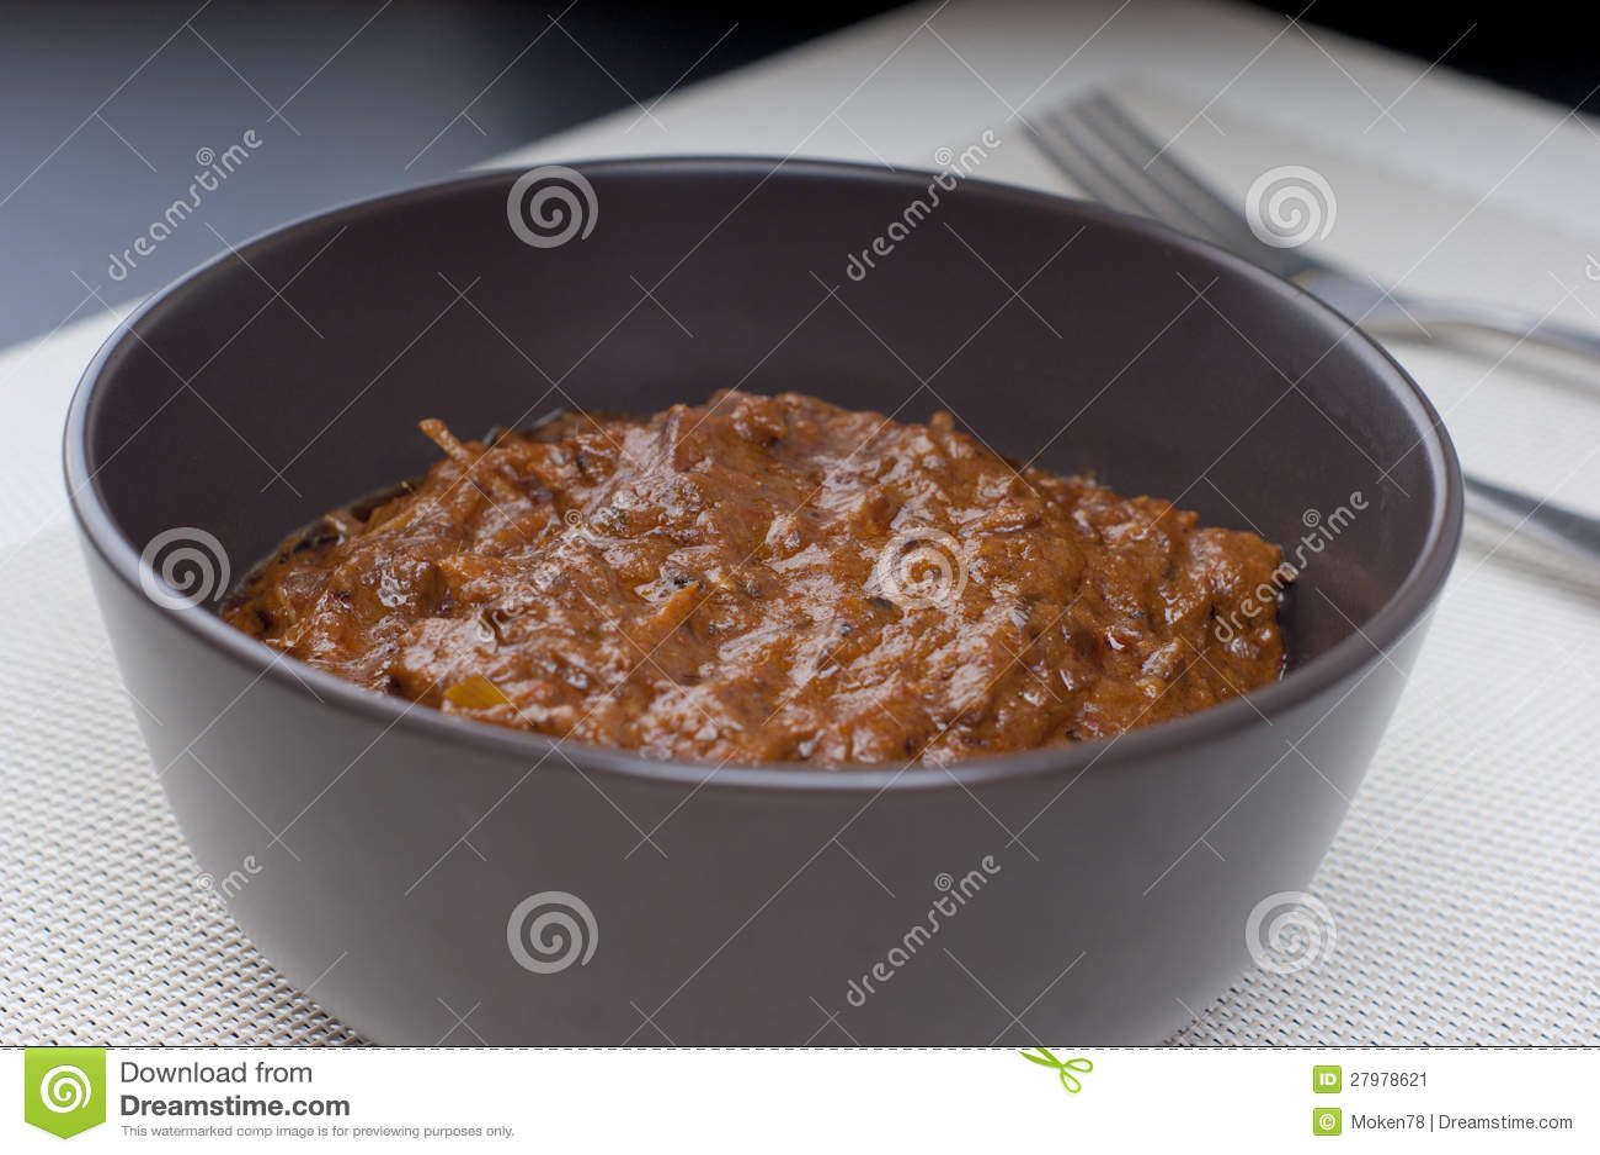 Fresh Hot Spicy Beef Rendang Stock Image - Image: 27978621